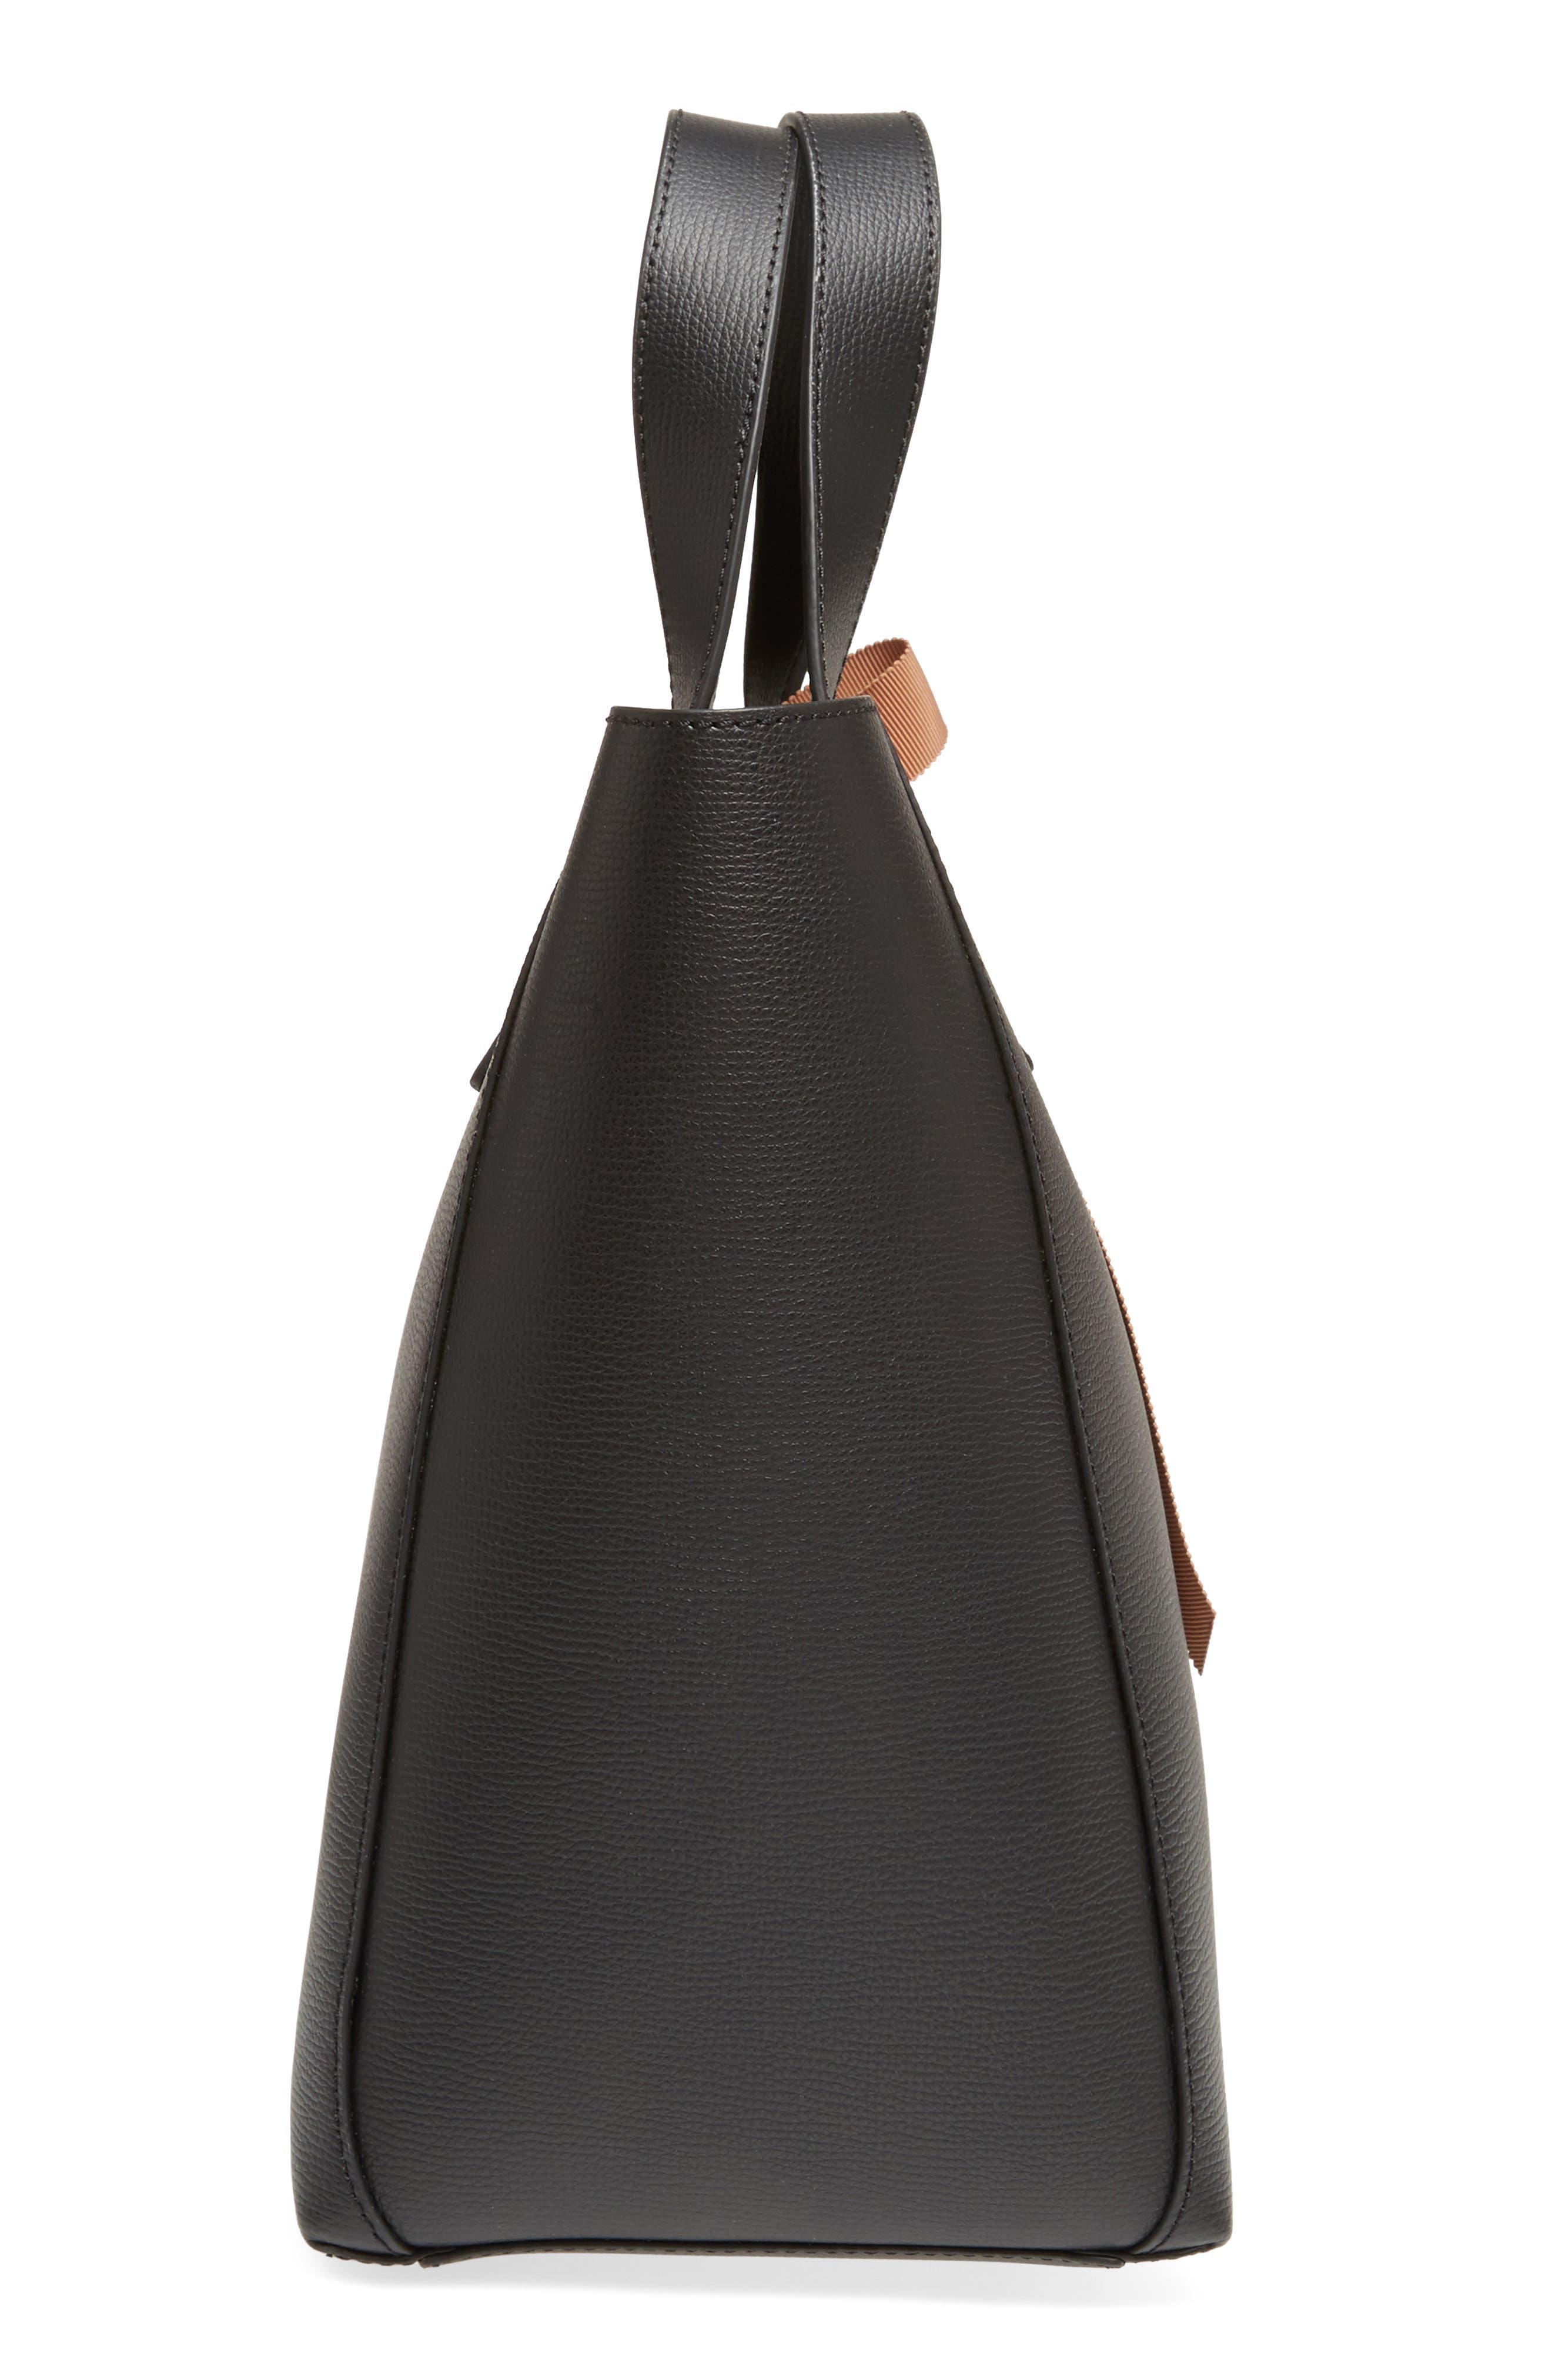 LOEFFLER RANDALL Leathers RIBBON TIE LEATHER TOP HANDLE SHOPPER - BLACK